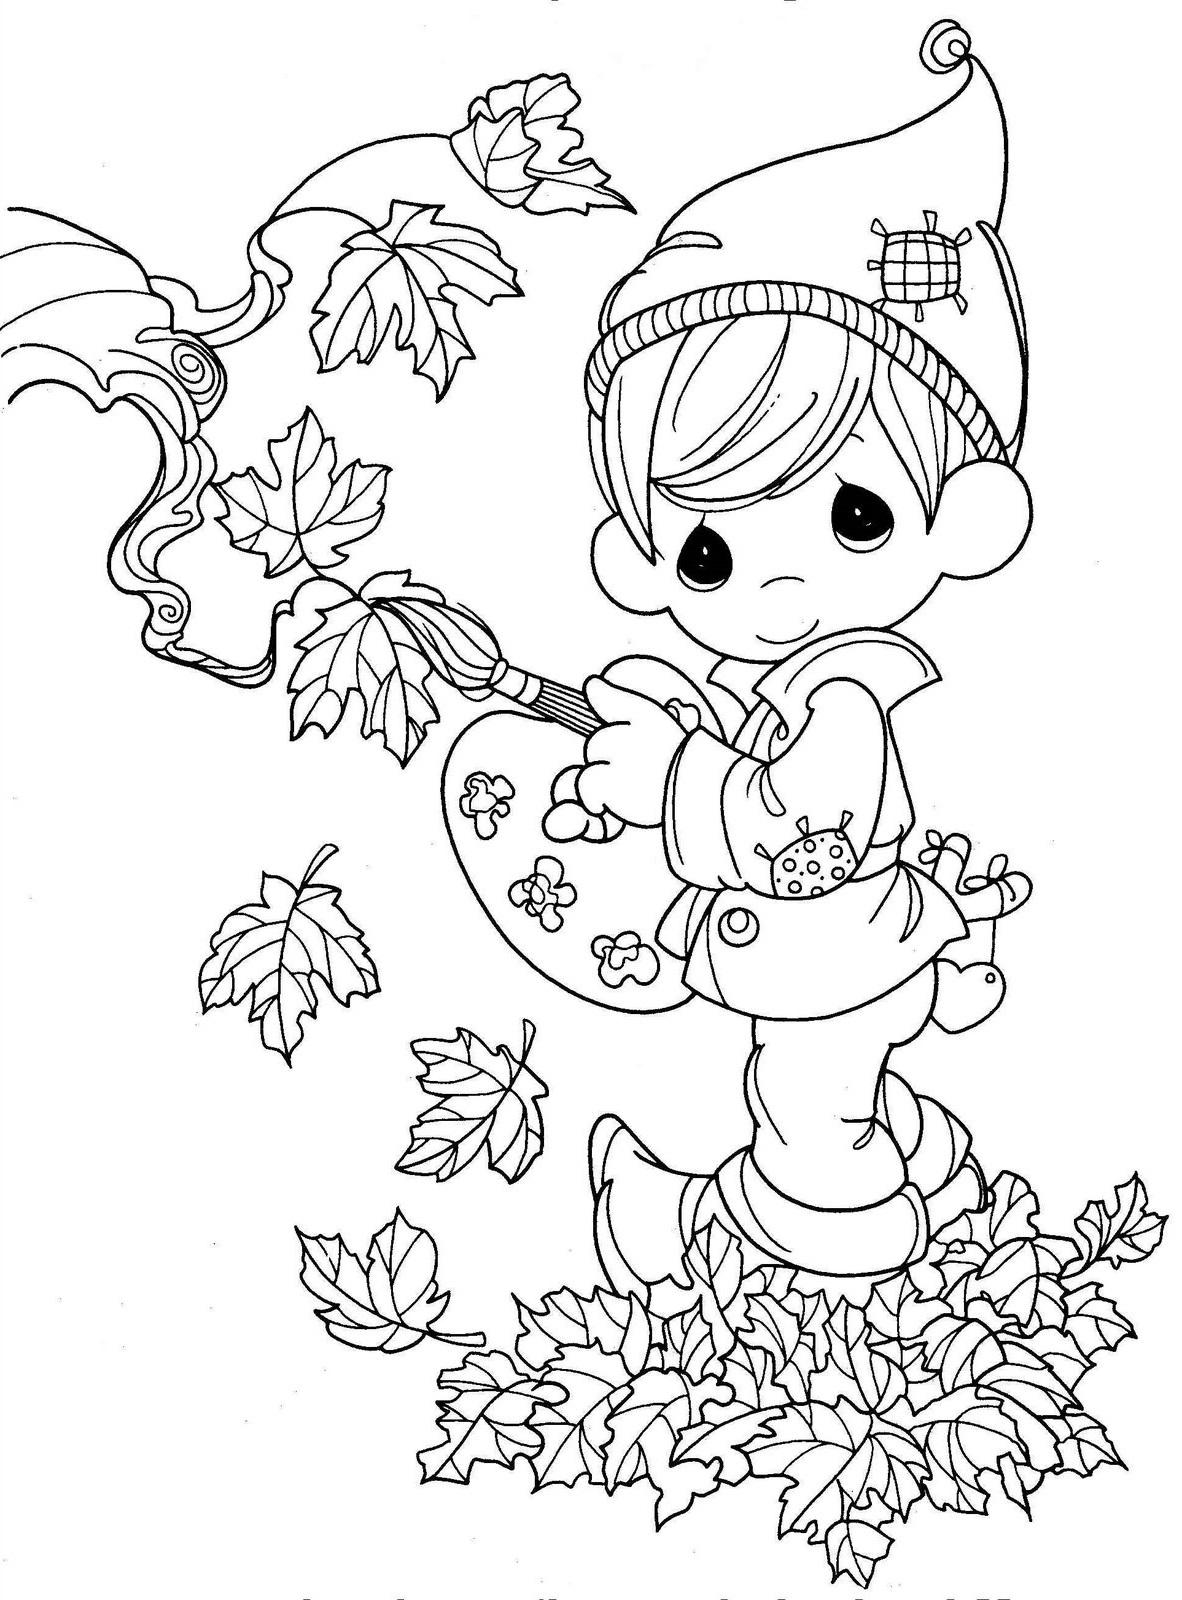 Fall Coloring Sheets As The Representative Of Fall